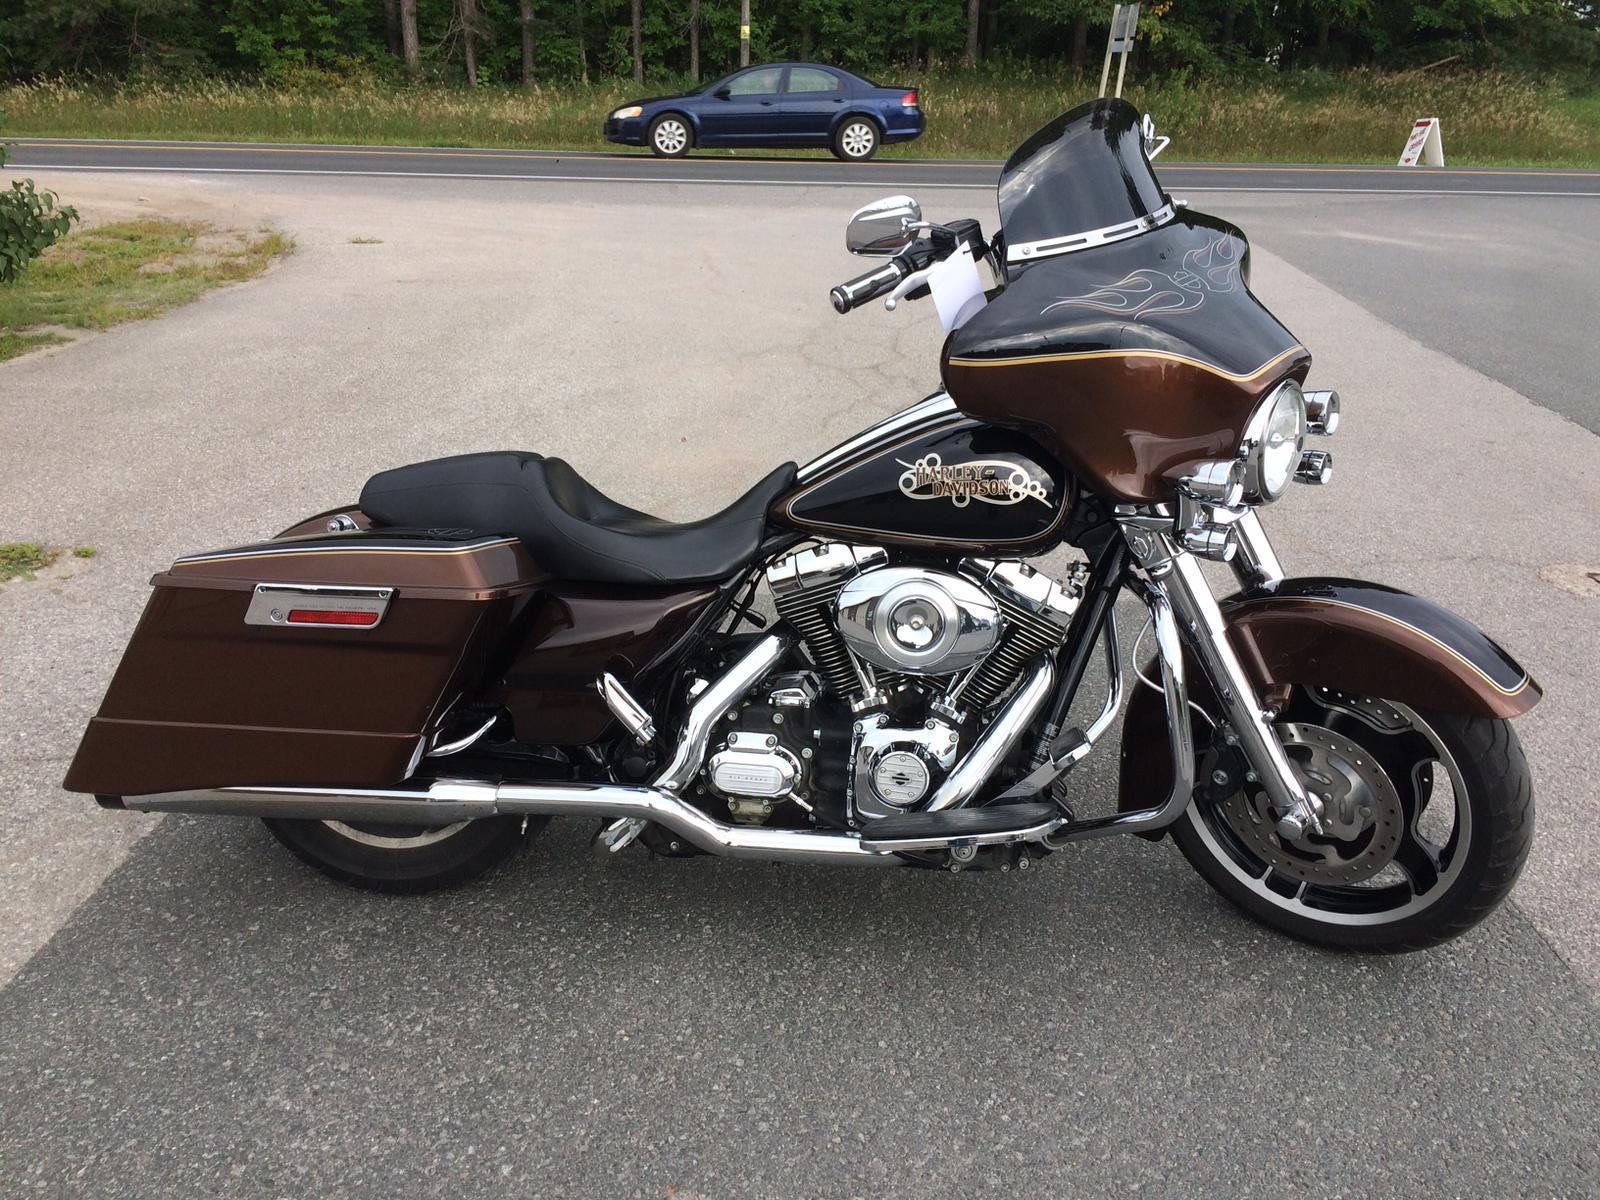 2012 Harley-Davidson® FLHX - Street Glide for sale in Lakefield, ON ...